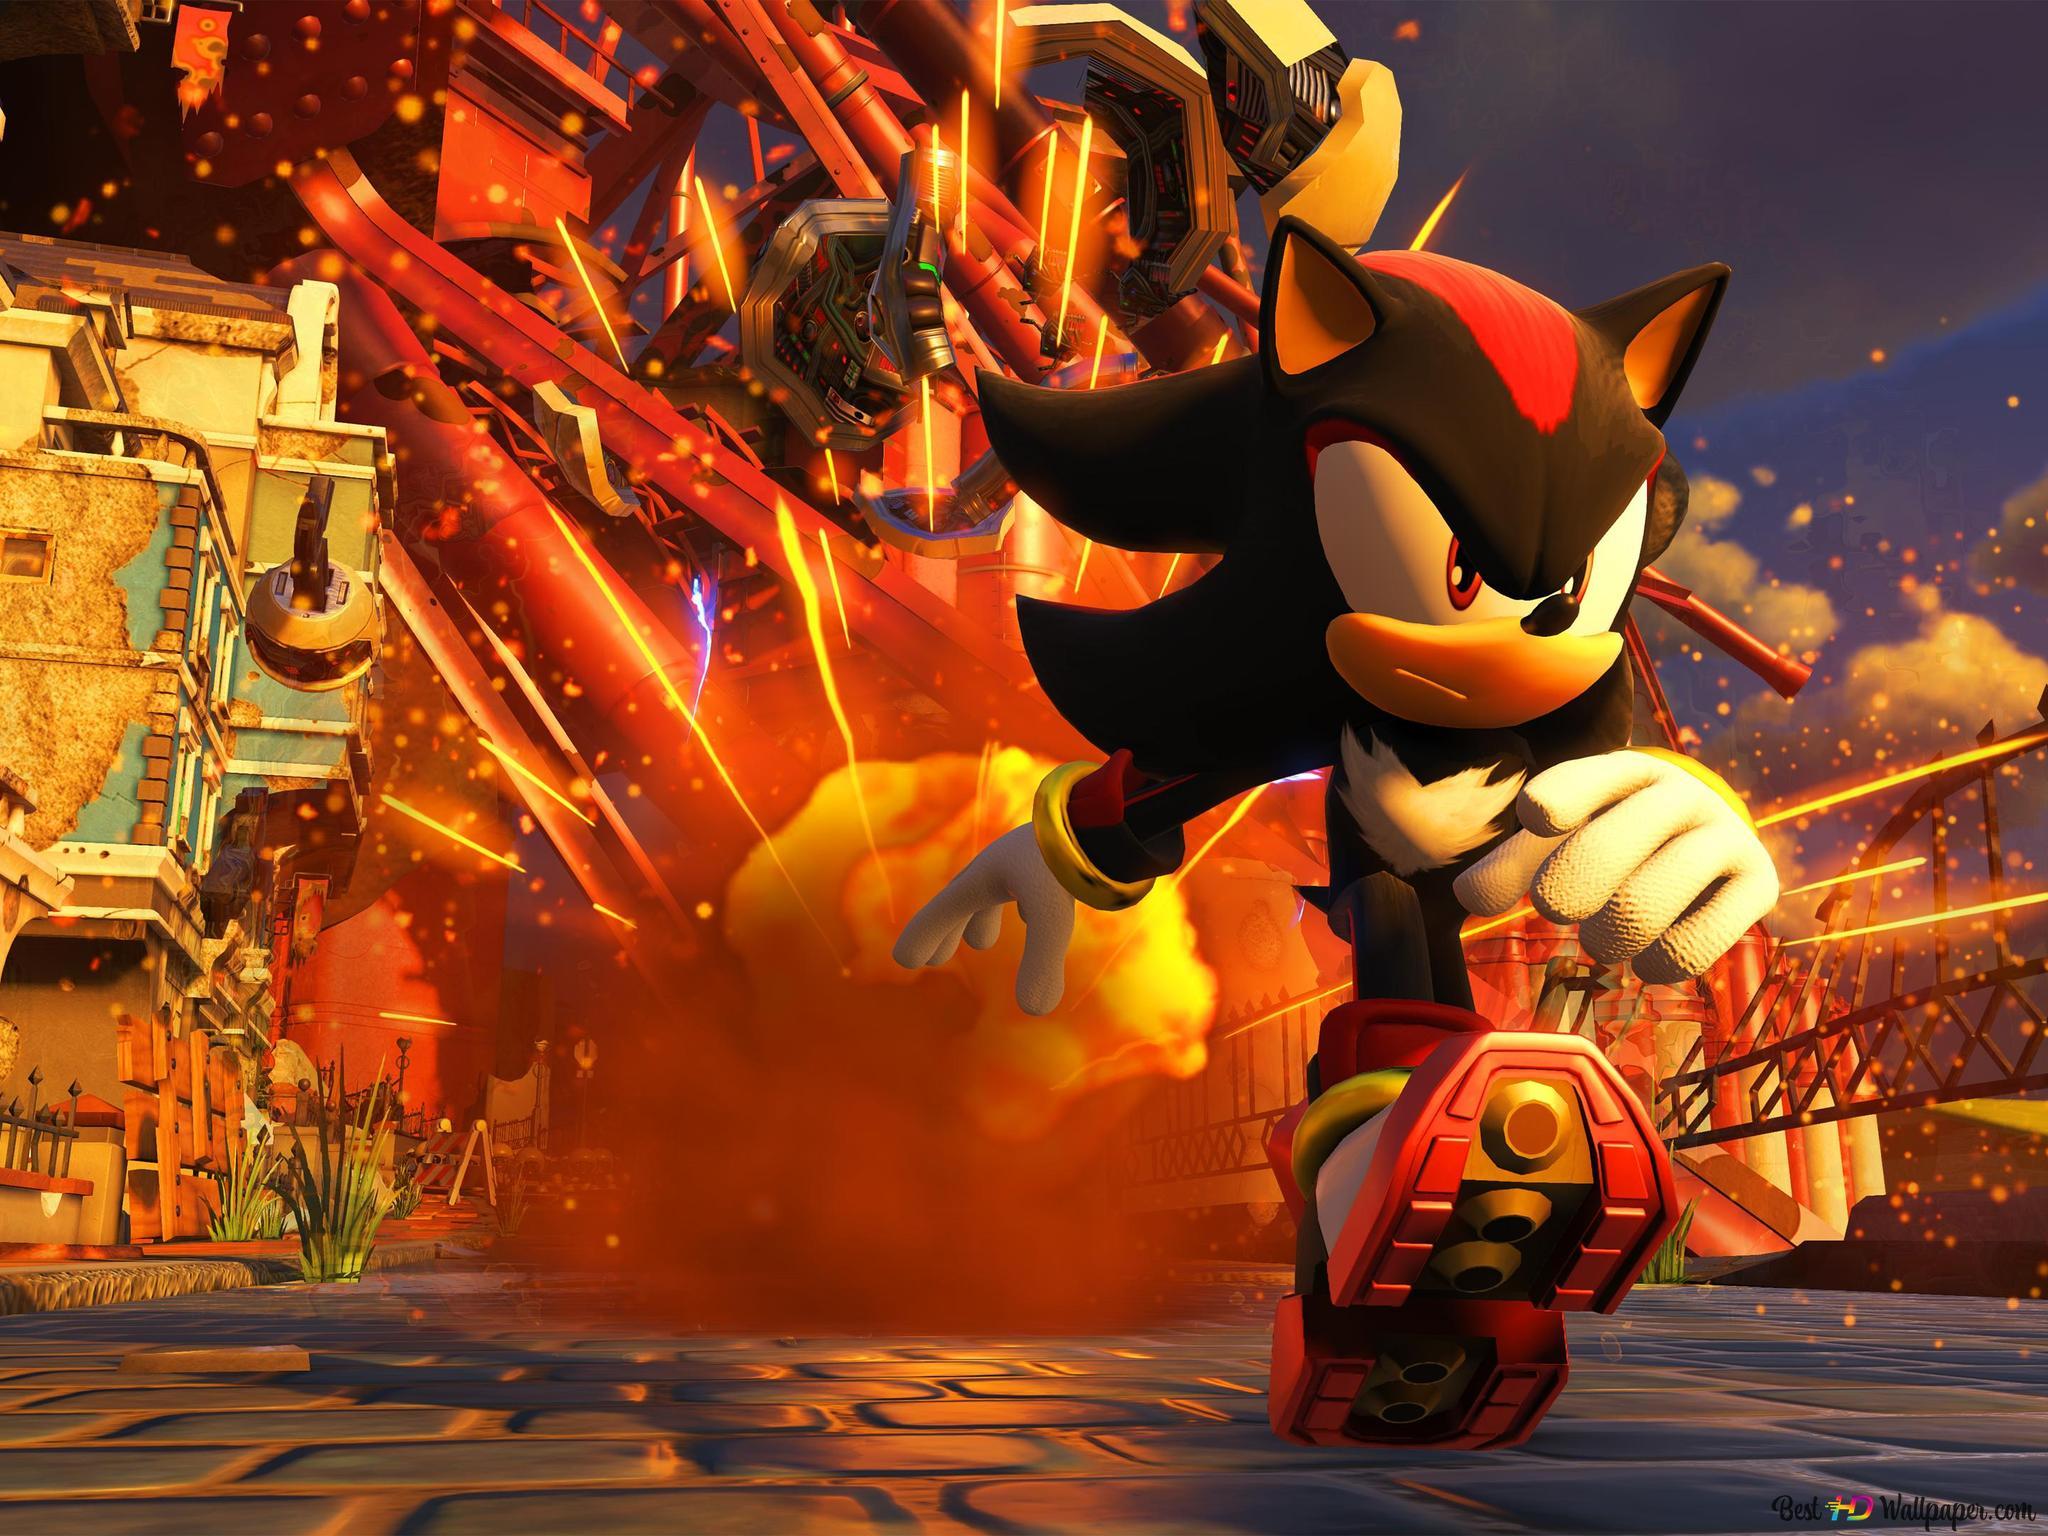 Sonic The Hedgehog Hd Wallpaper Download